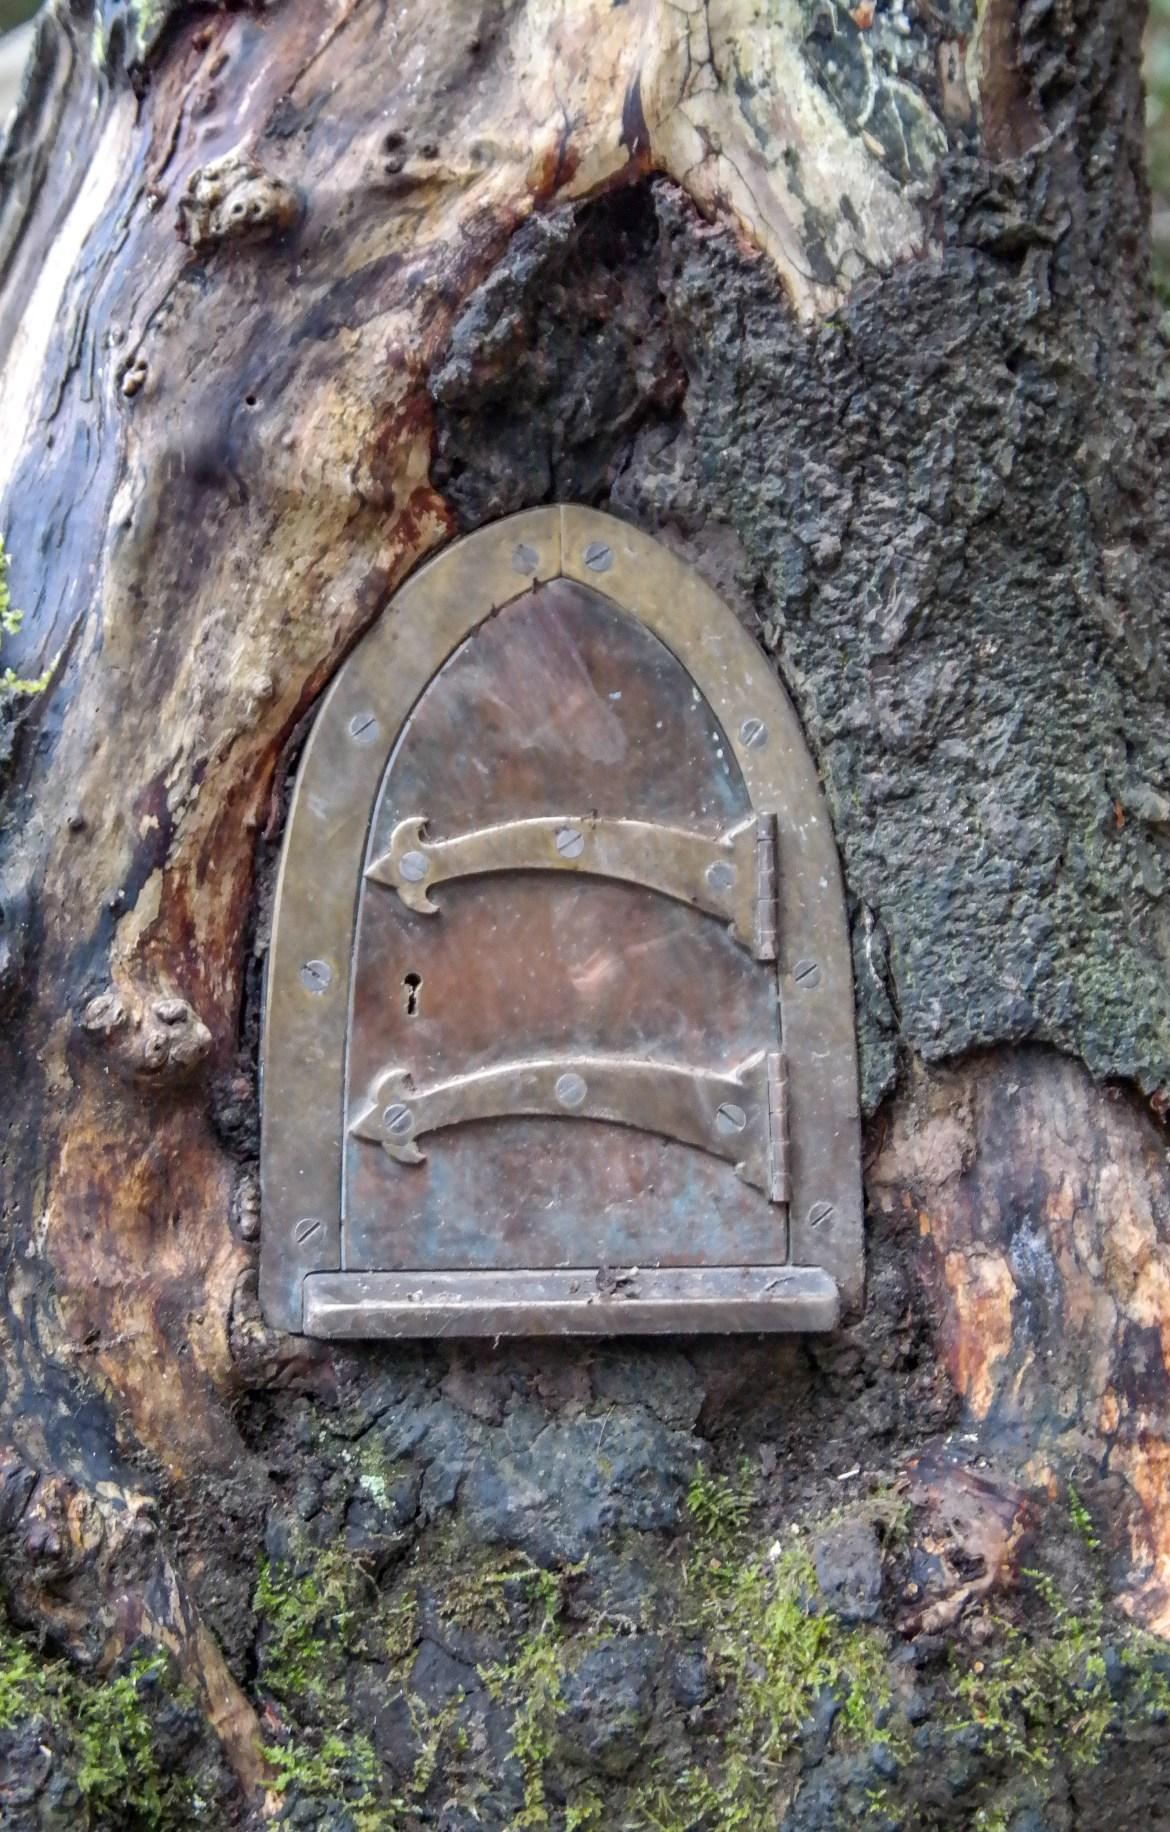 Winnie the Pooh's House Ashdown Forest aka 100 Aker Wood